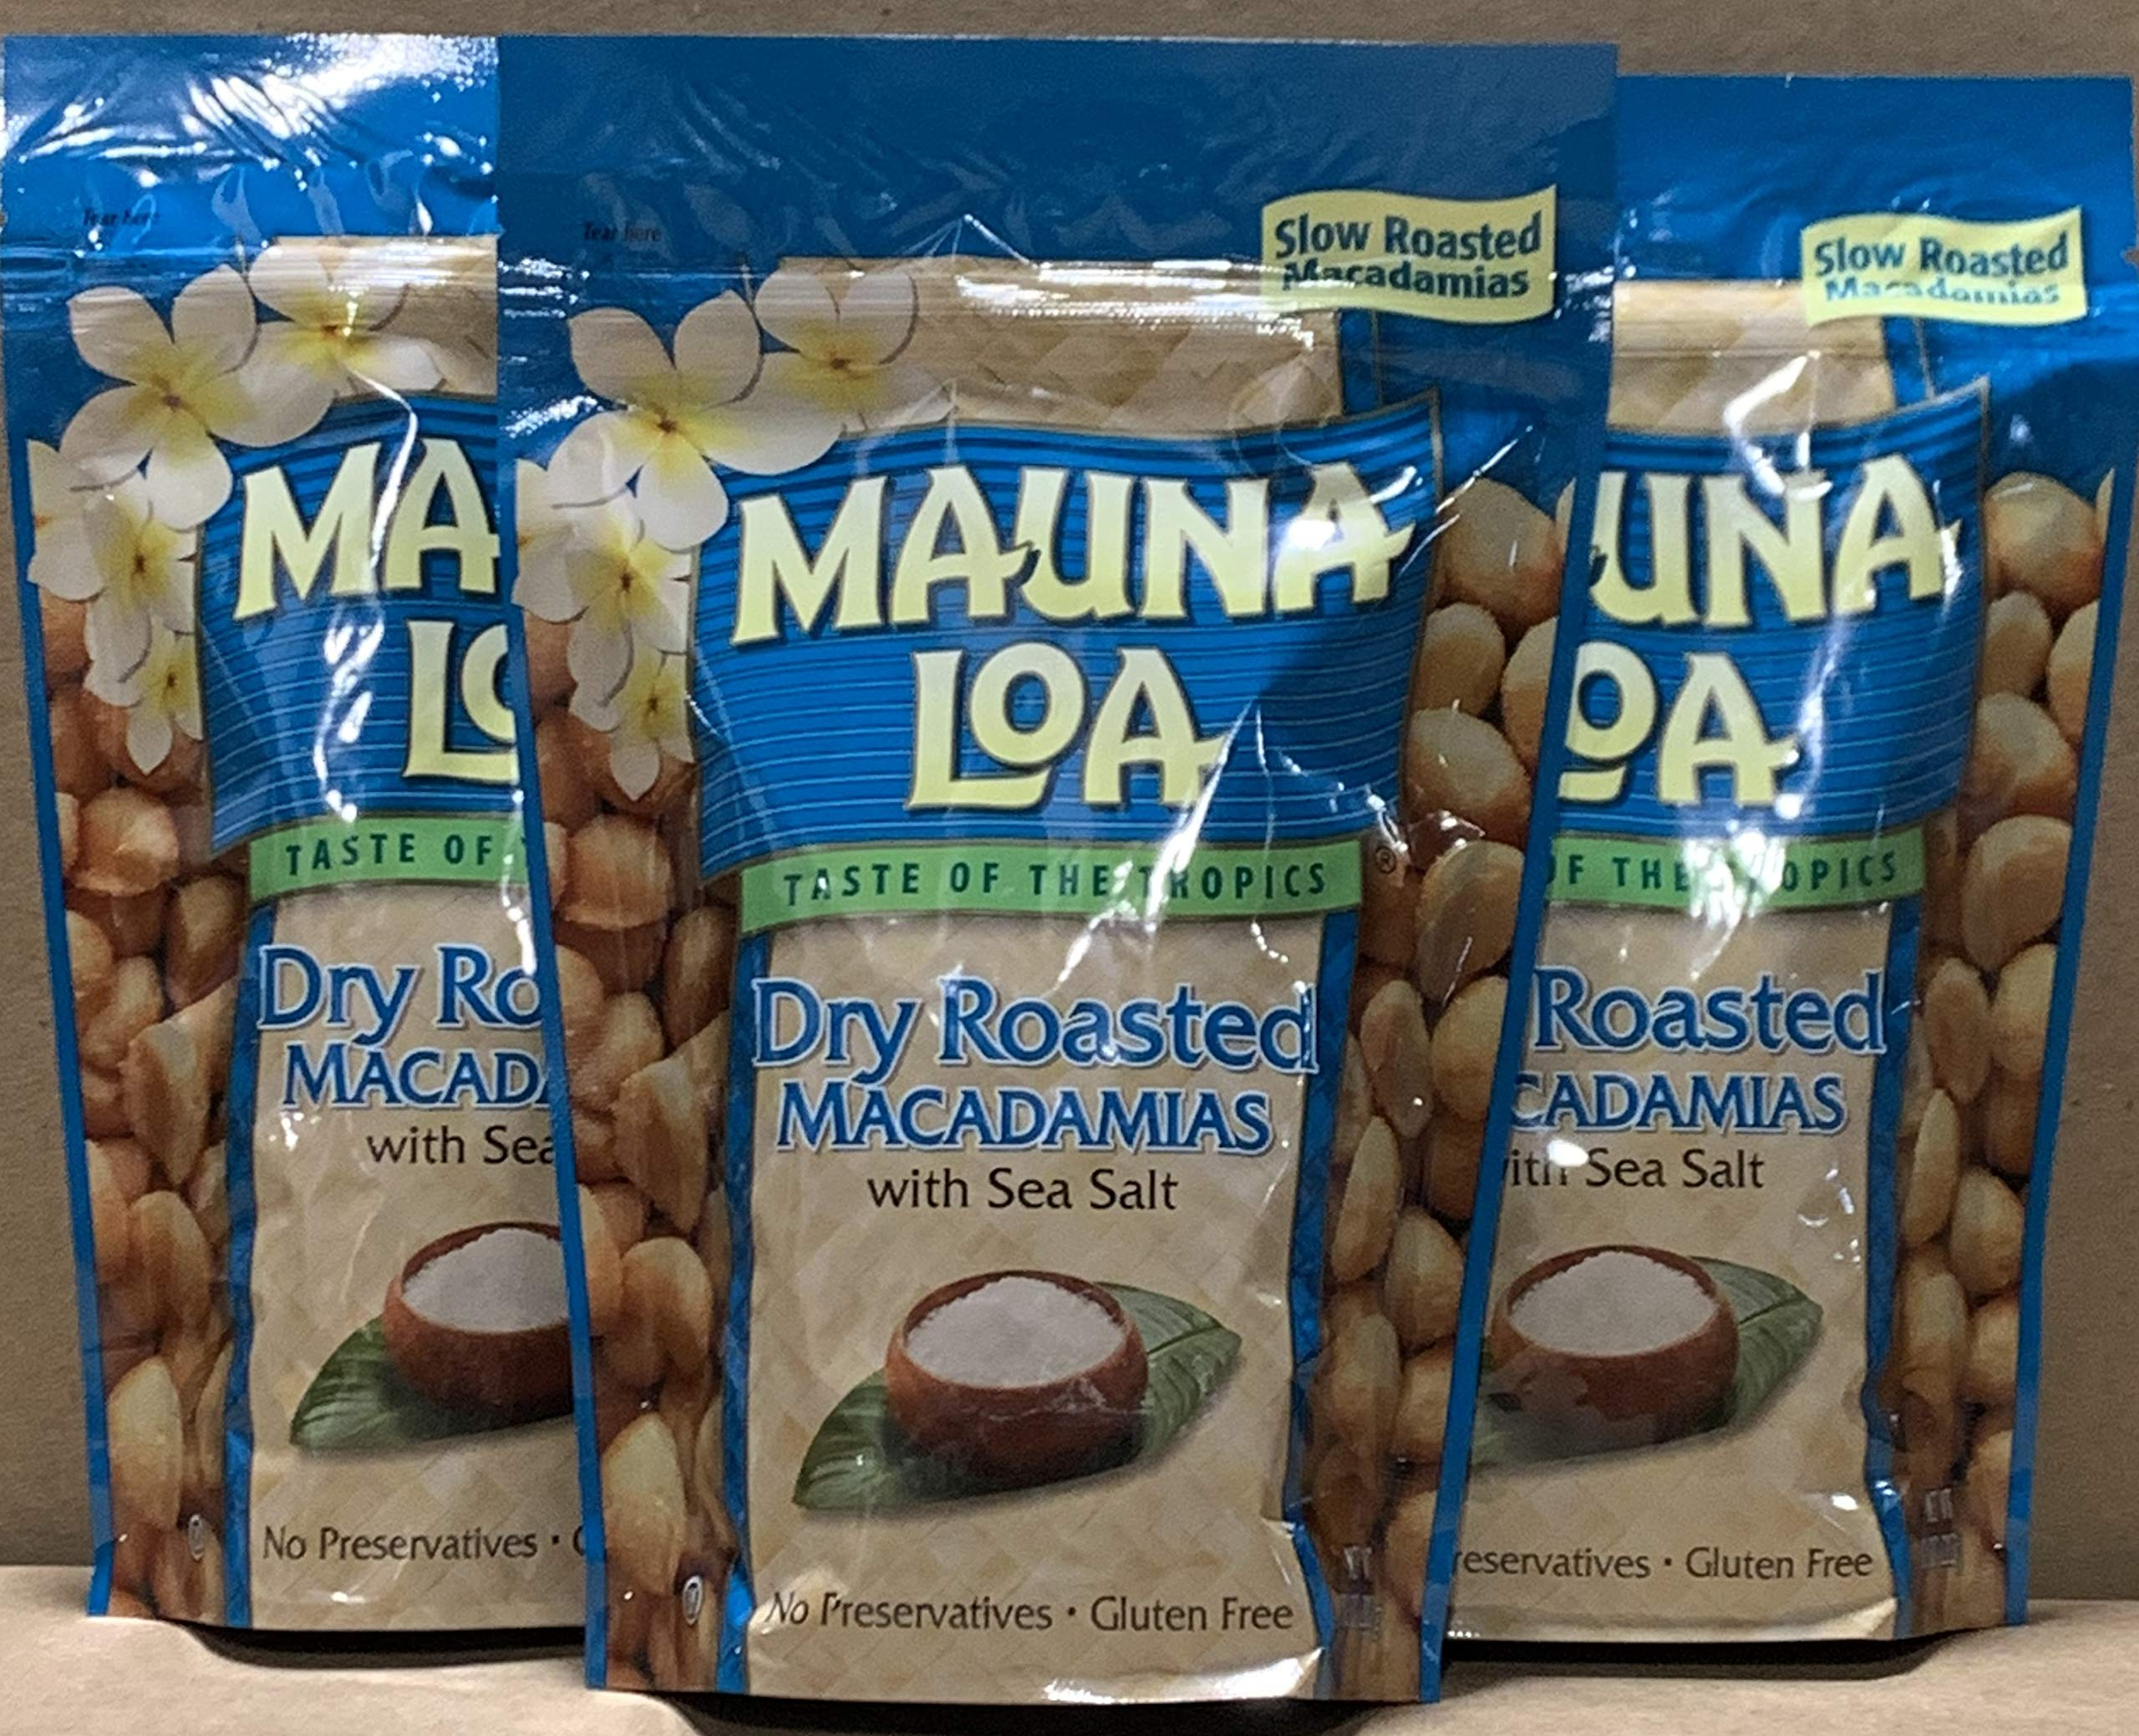 KC Commerce Gift Set Mauna Loa Macadamias, Dry Roasted with Sea Salt, 10-oz (Dry Roasted With Sea Salt 10oz Pack of 3)